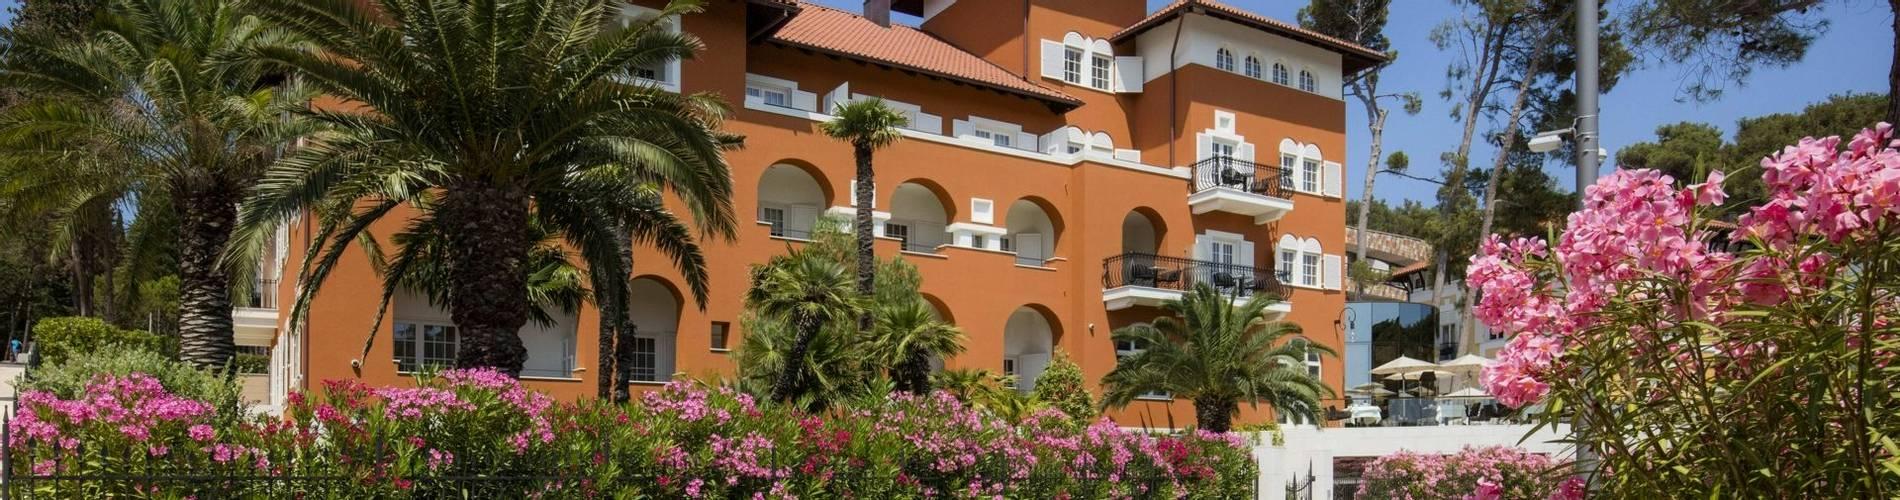 06.Boutique Hotel Alhambra_02 (1).jpg